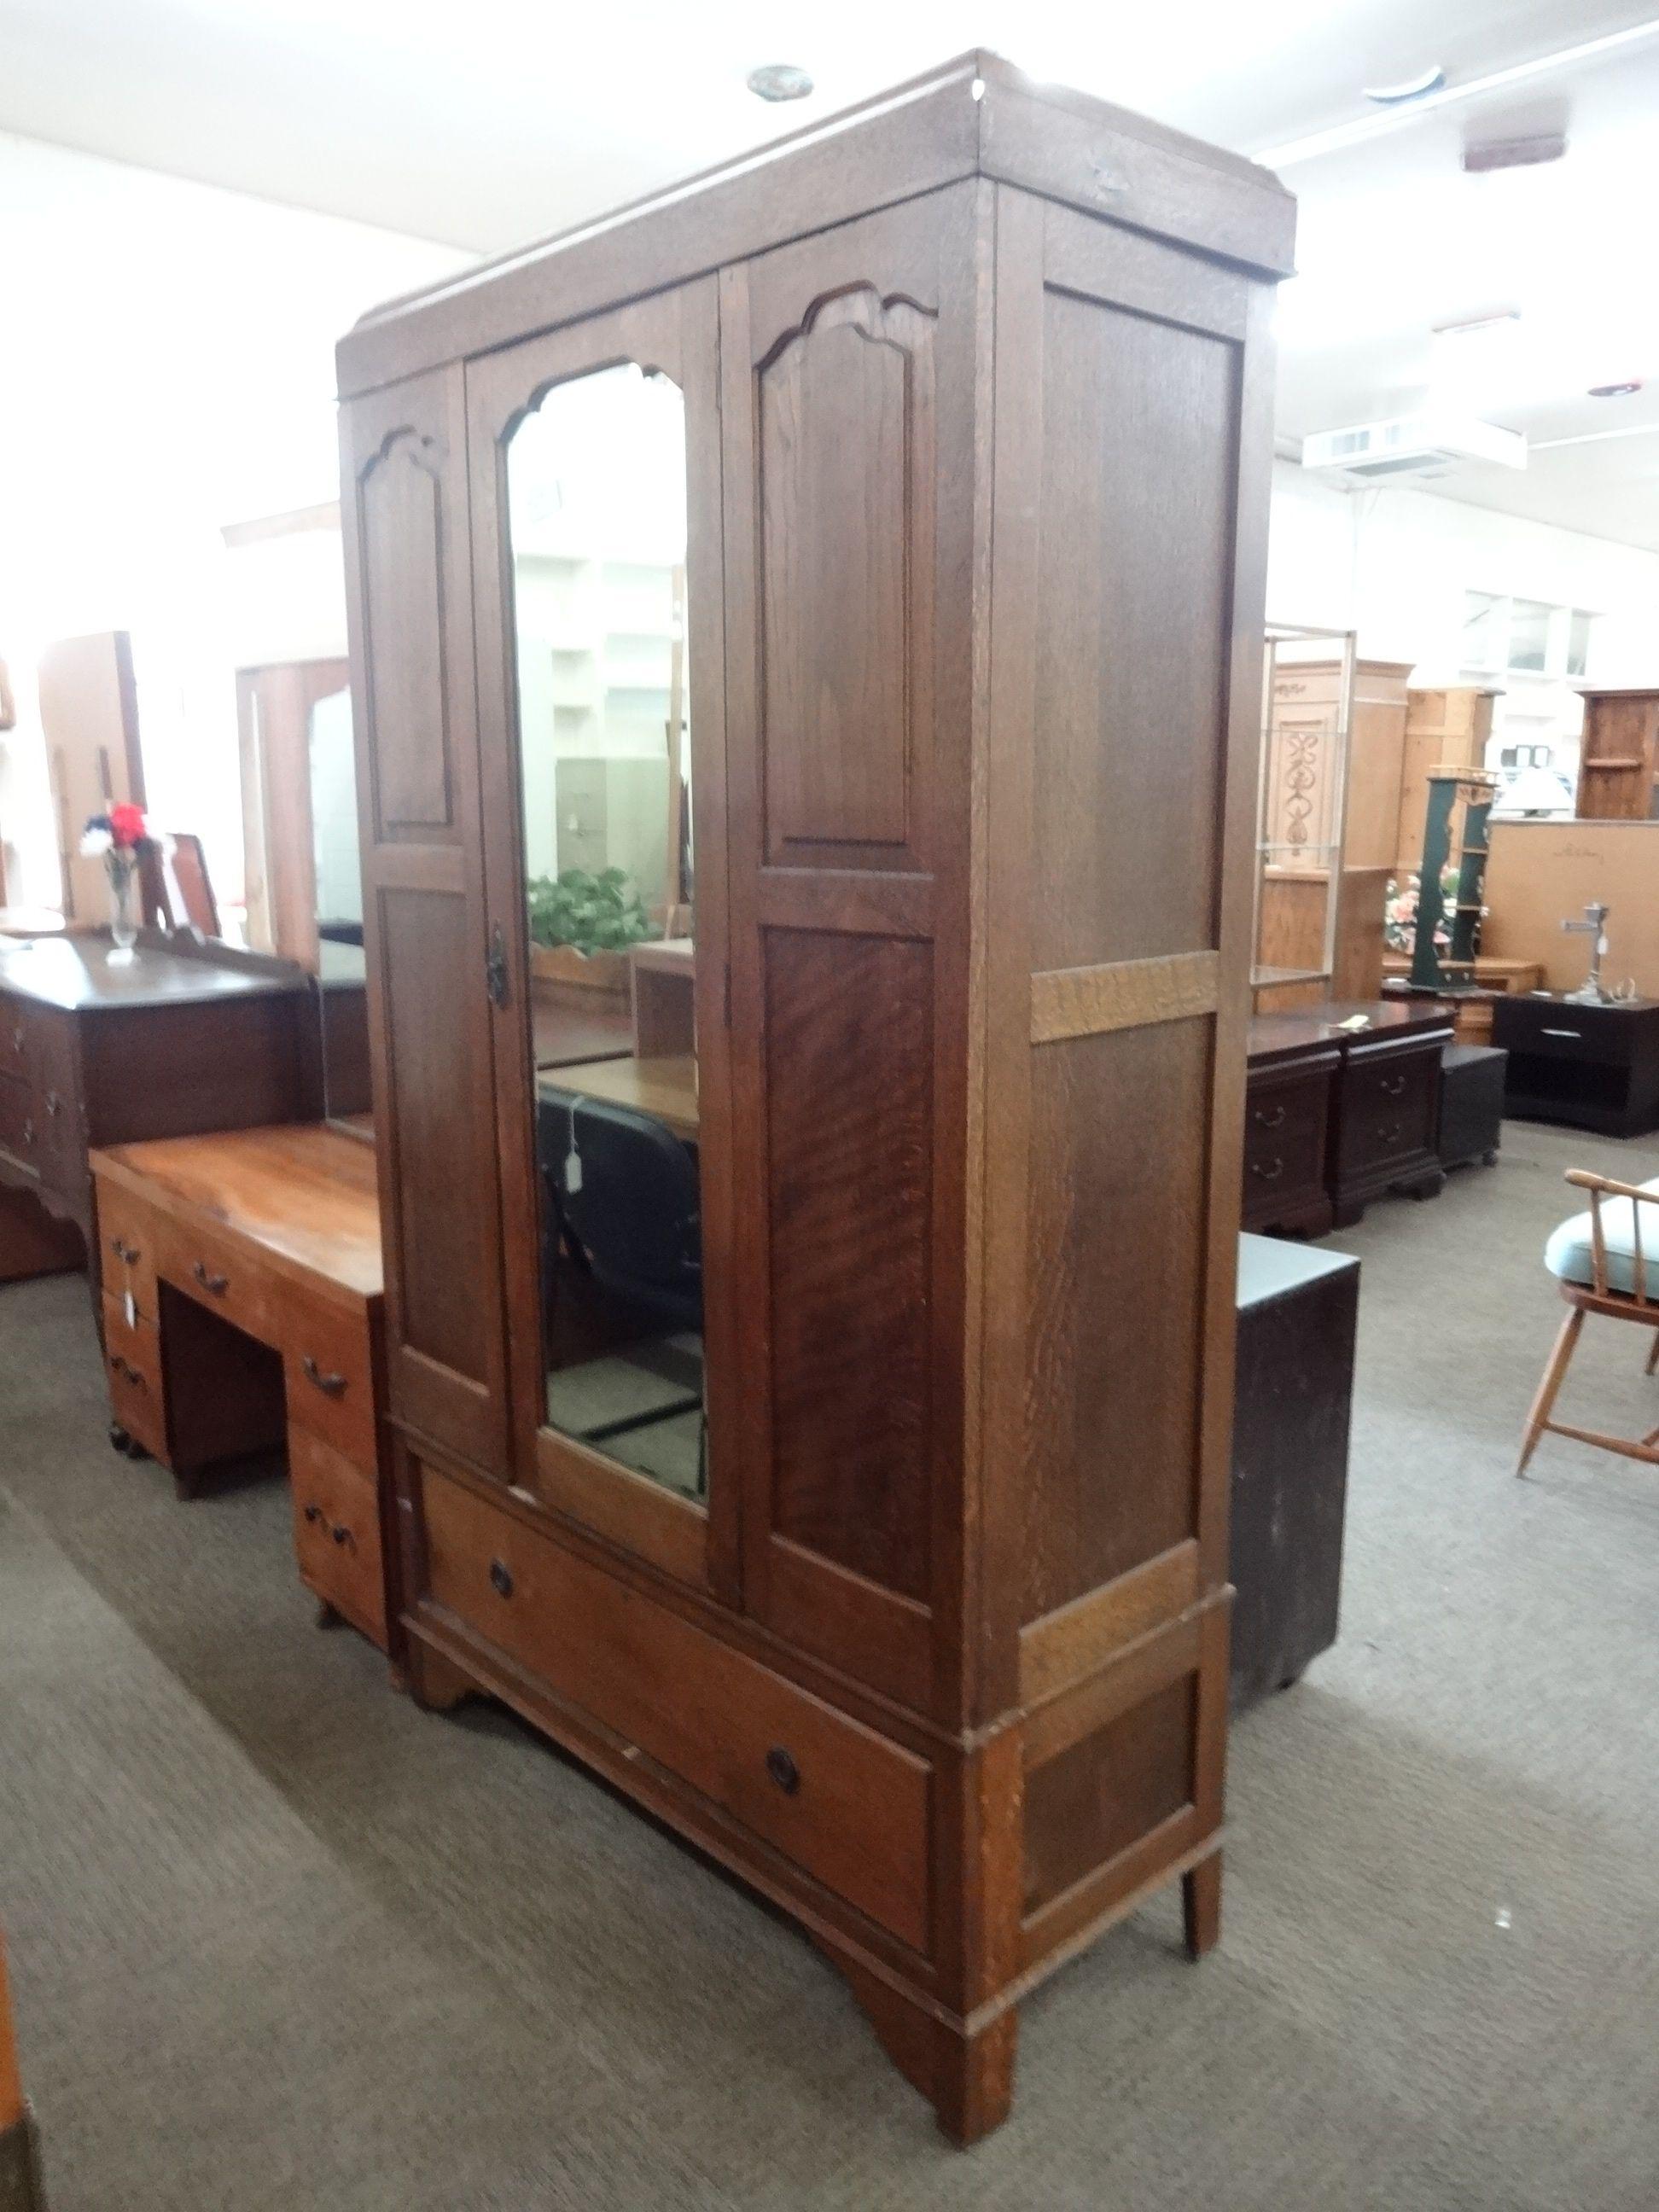 Early 1900s Clothing Wardrobe 8324 Dark Oak Original Beveled Mirror Removable Shelving